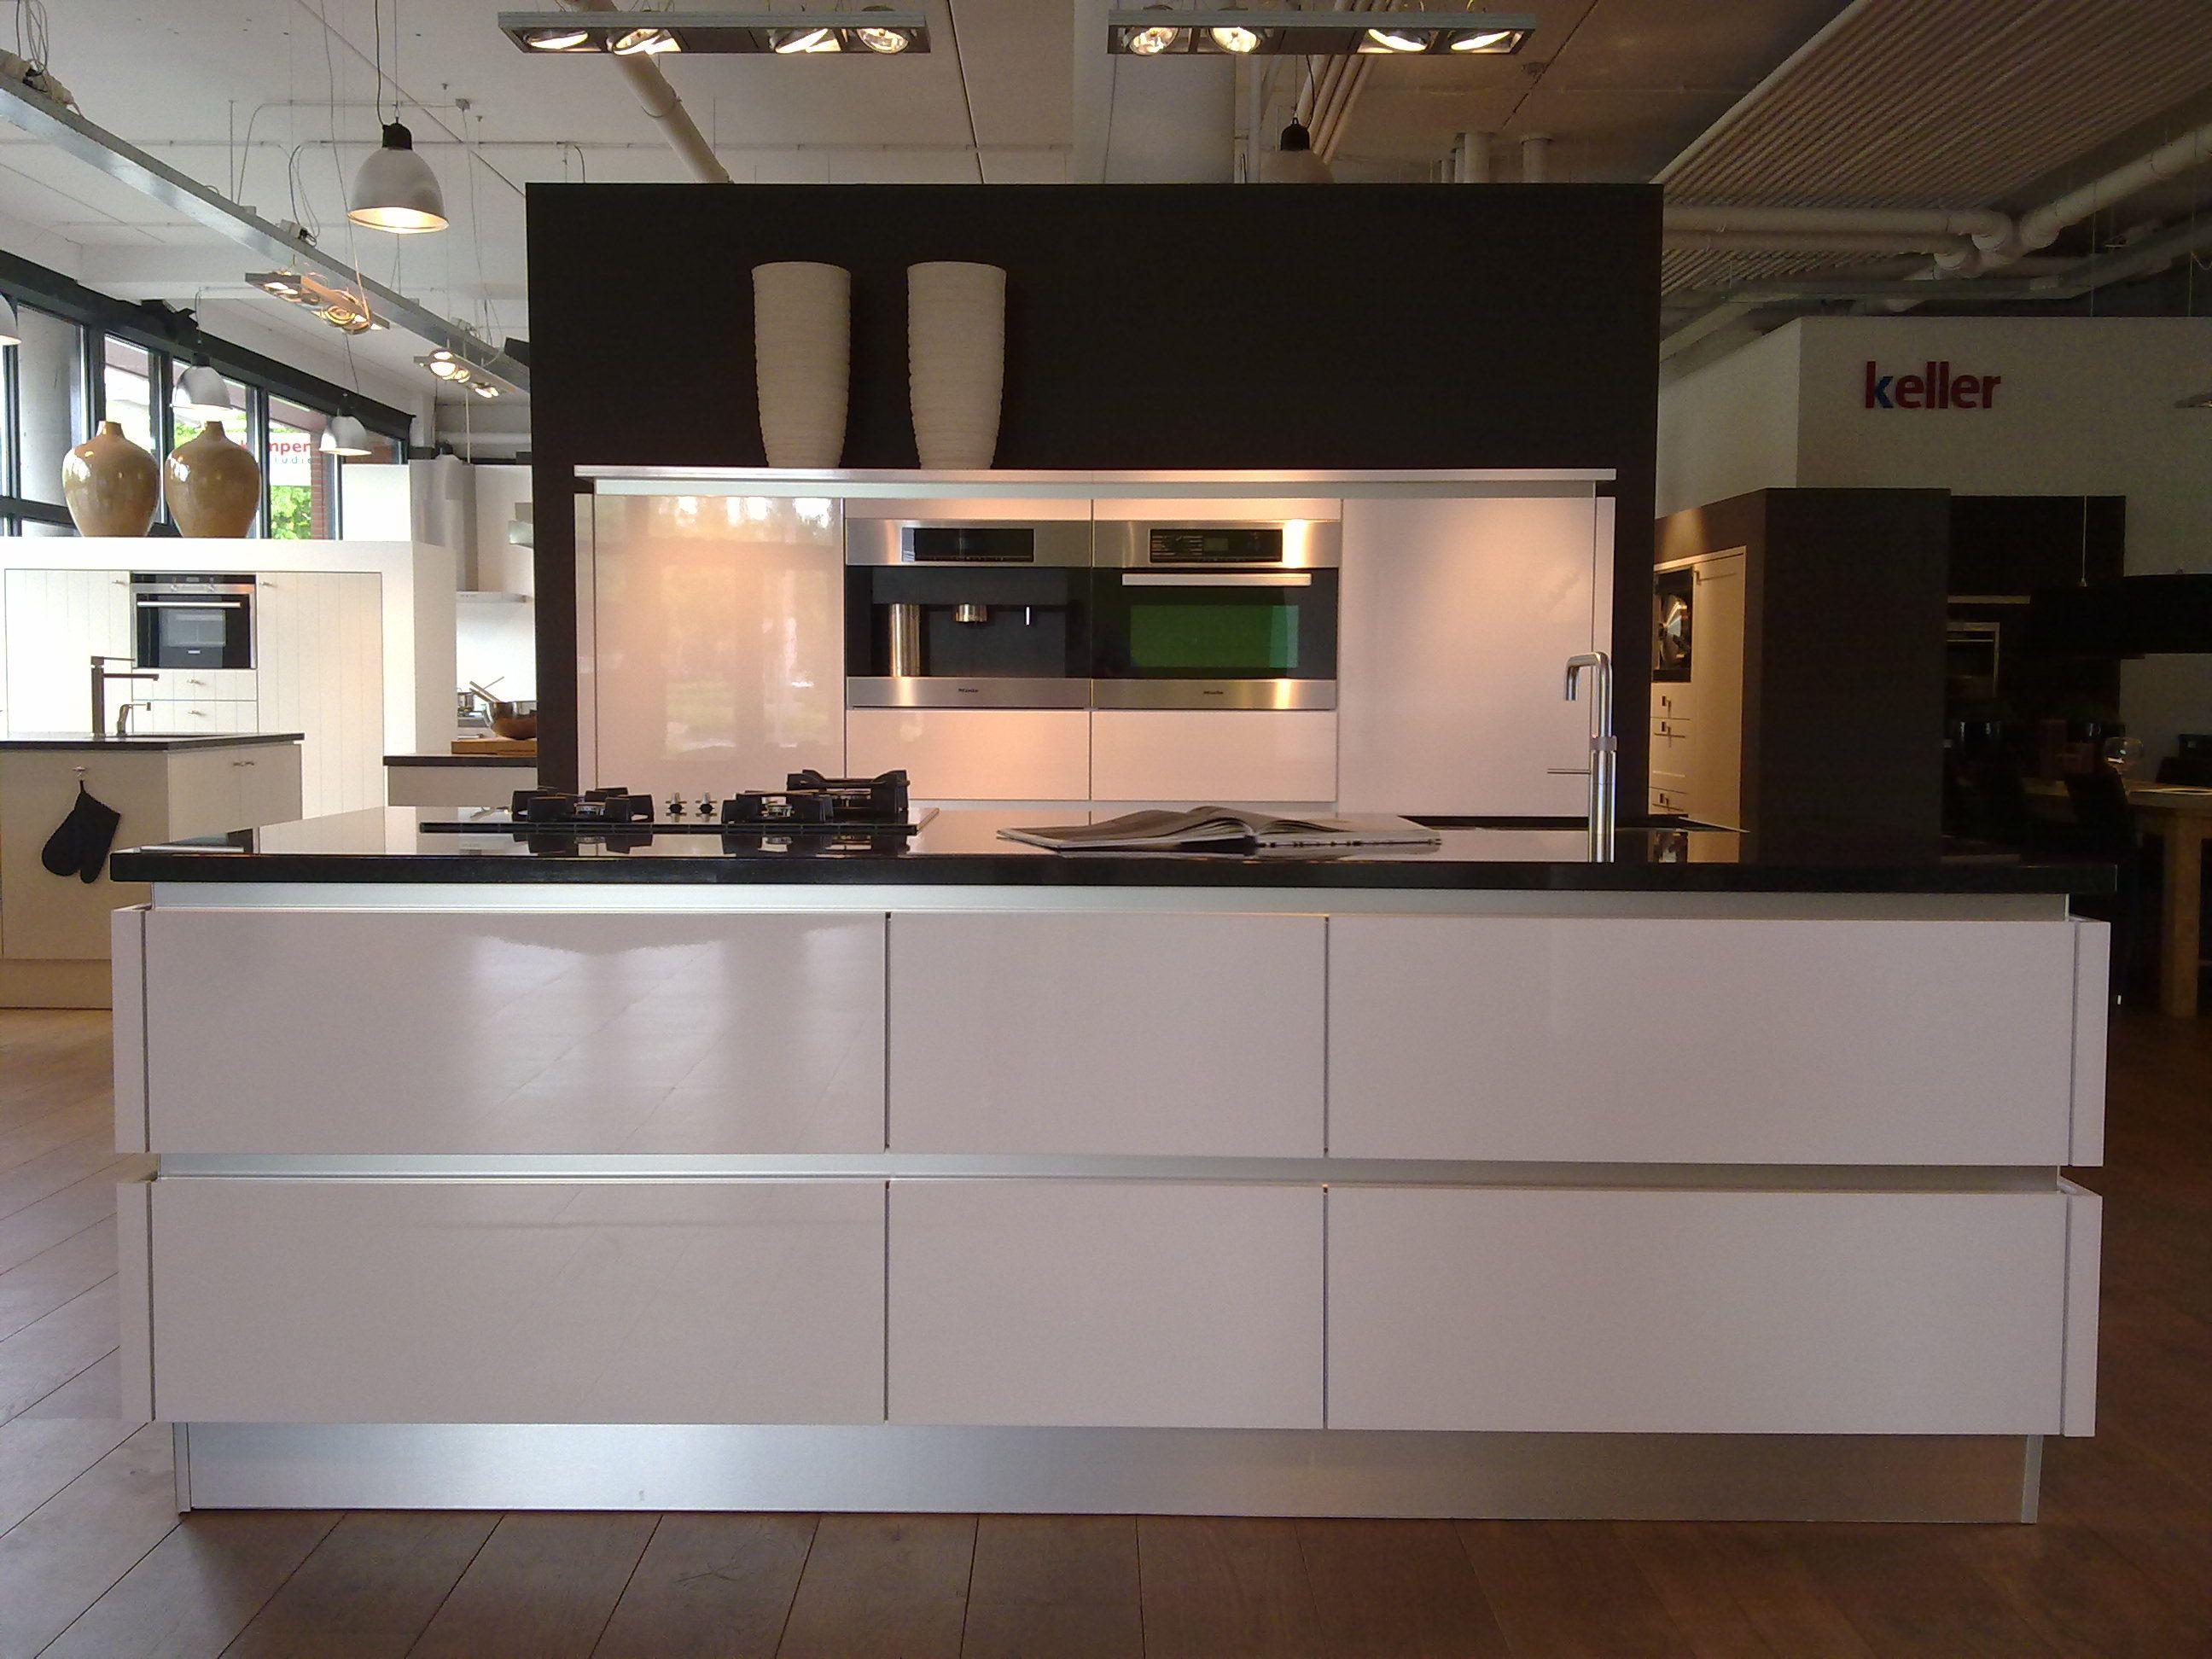 Keuken keller keukens lade galerij foto 39 s van binnenlandse en moderne binnenhuisarchitectuur - Fotos van keuken amenagee ...